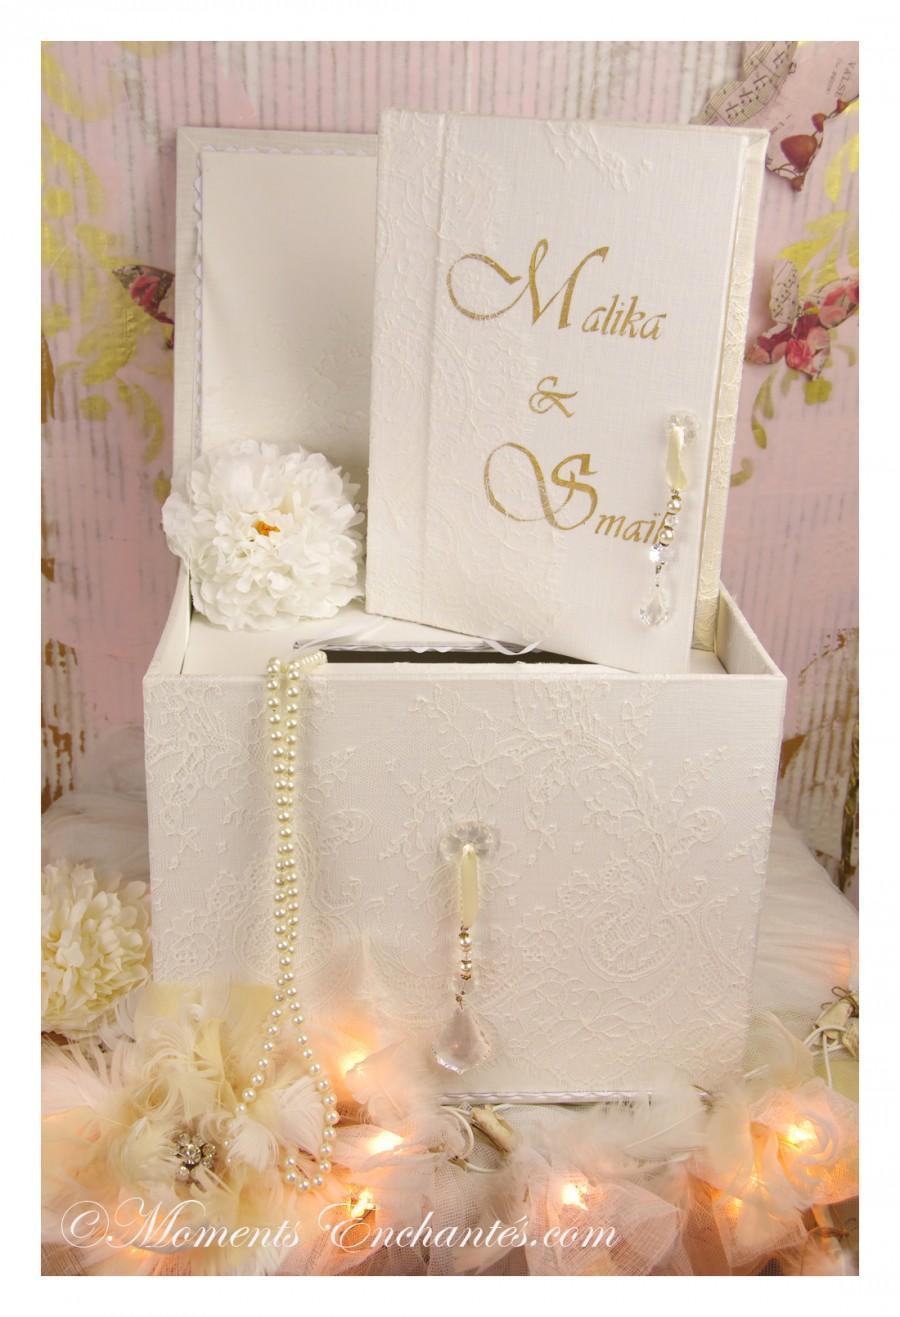 urne mariage le livre d 39 or mariage l 39 album photos mariage moments enchant s 2177381 weddbook. Black Bedroom Furniture Sets. Home Design Ideas